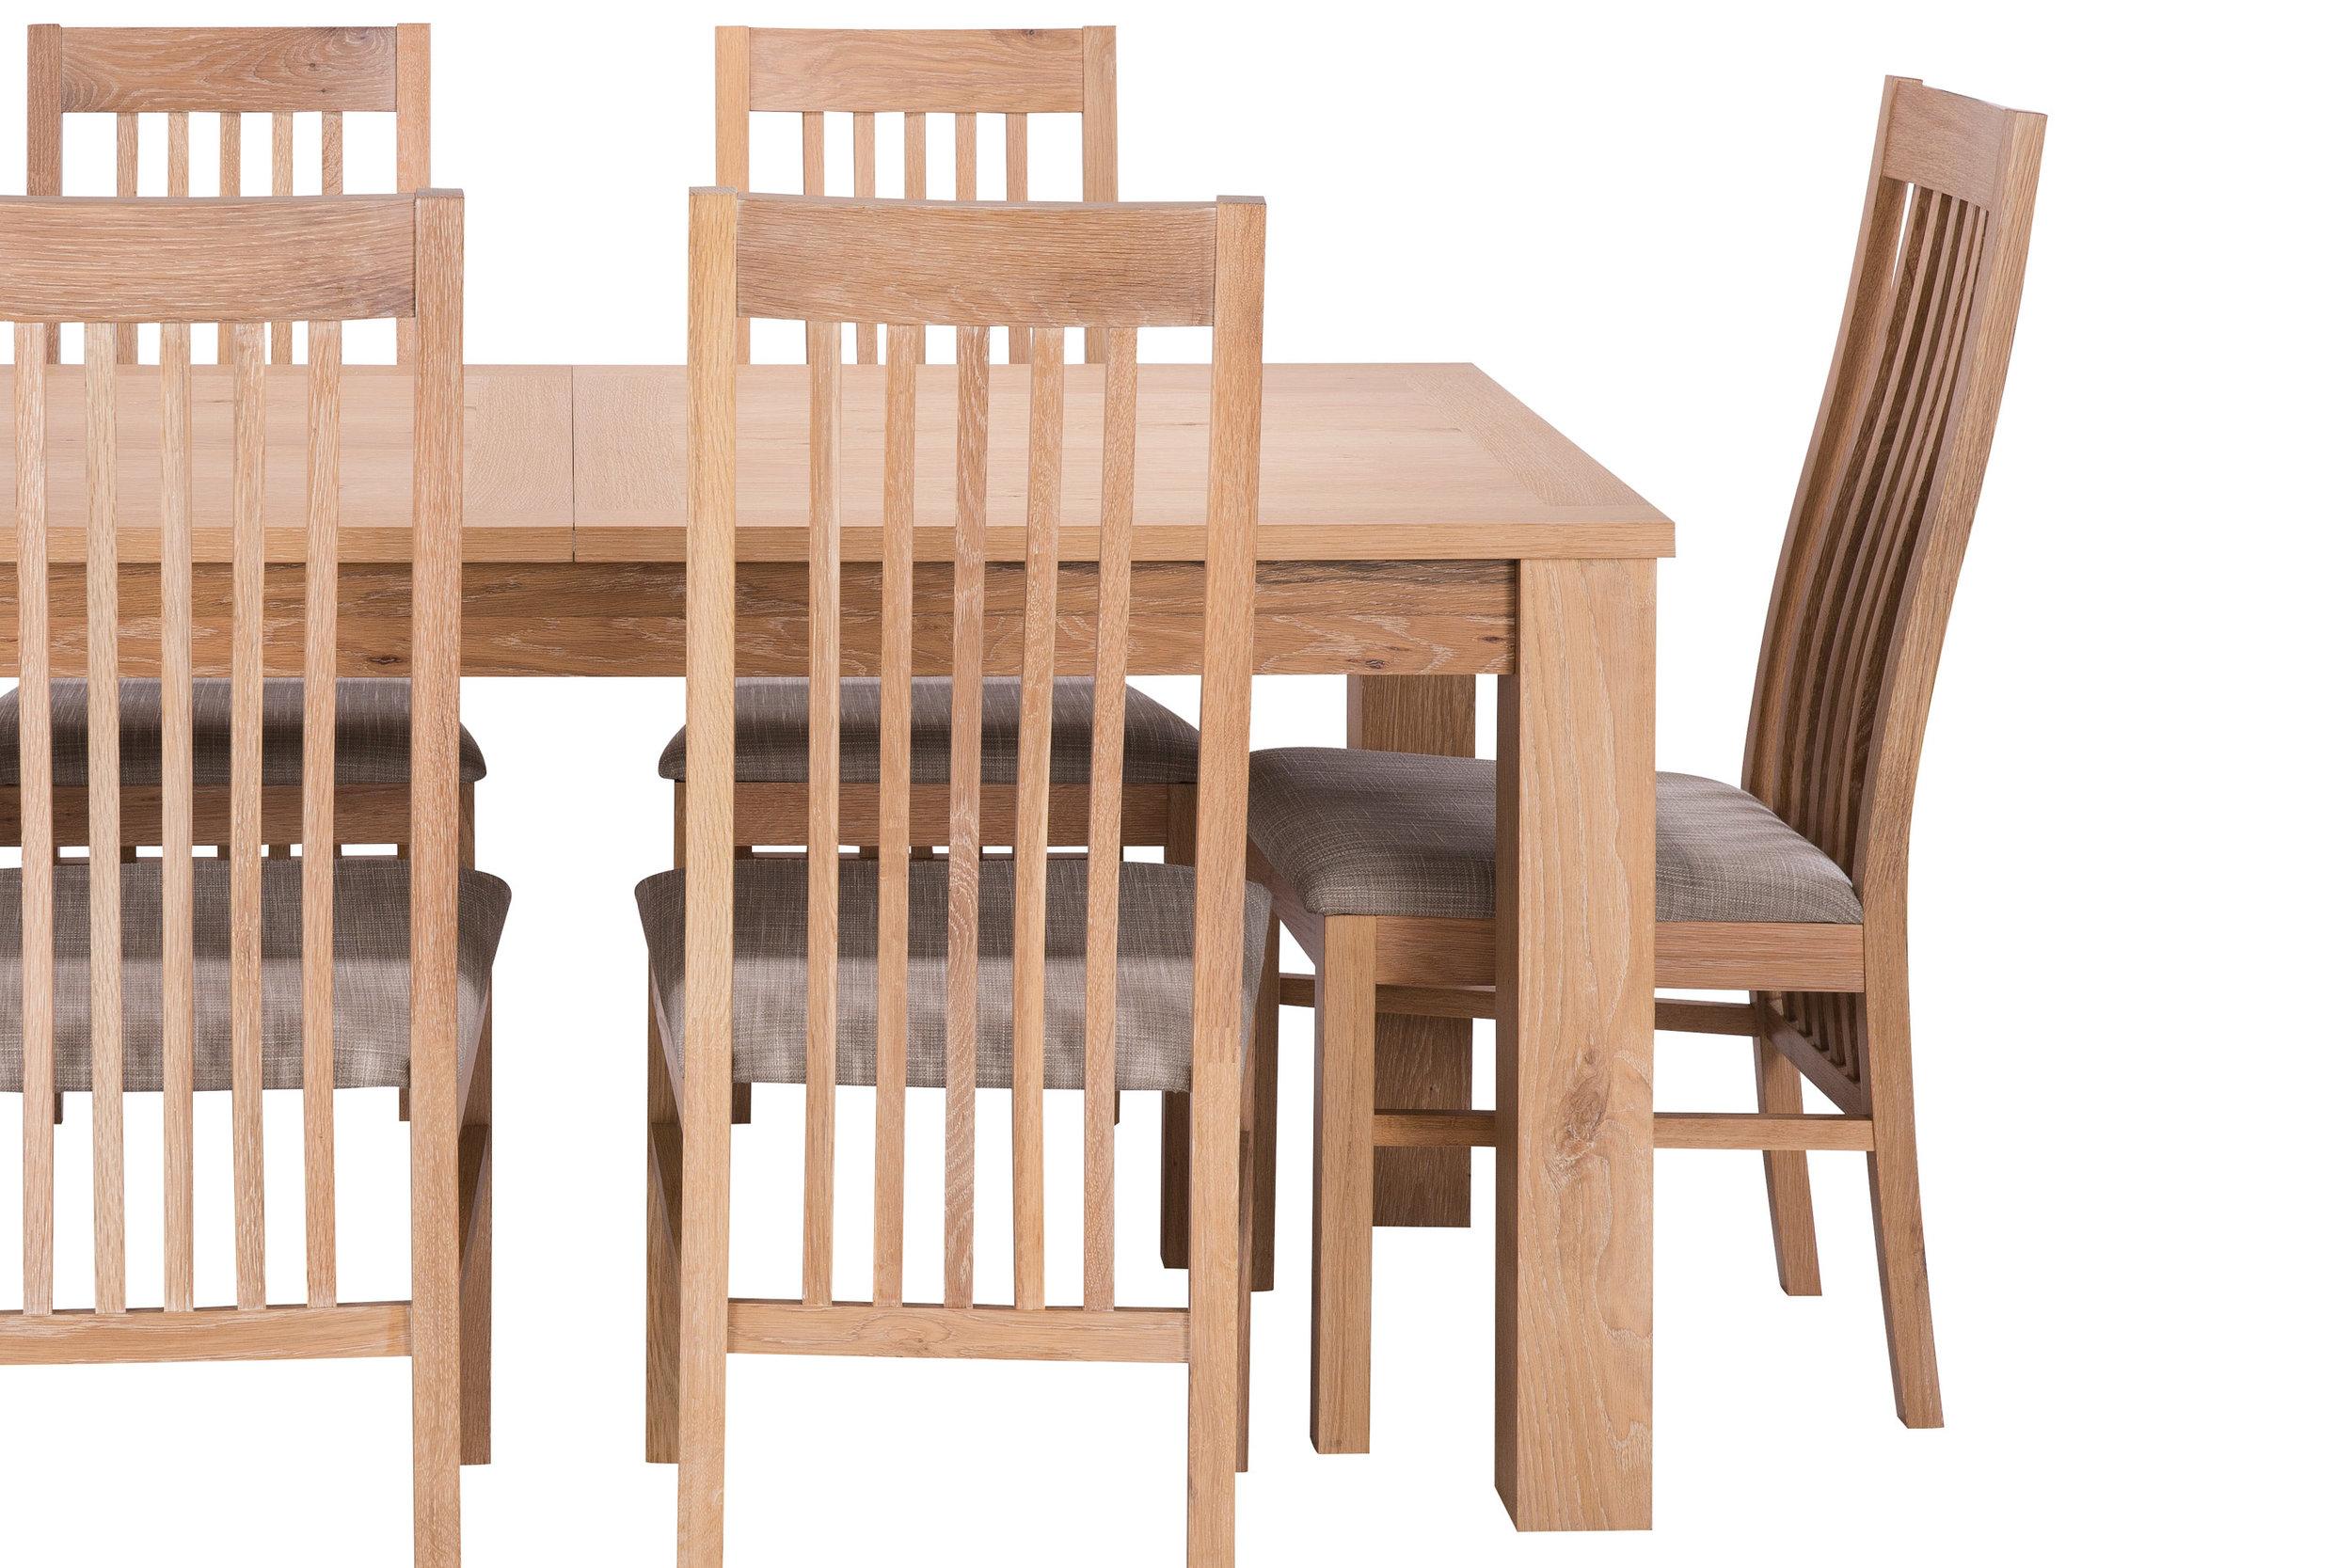 furniture product_TBP_4.jpg